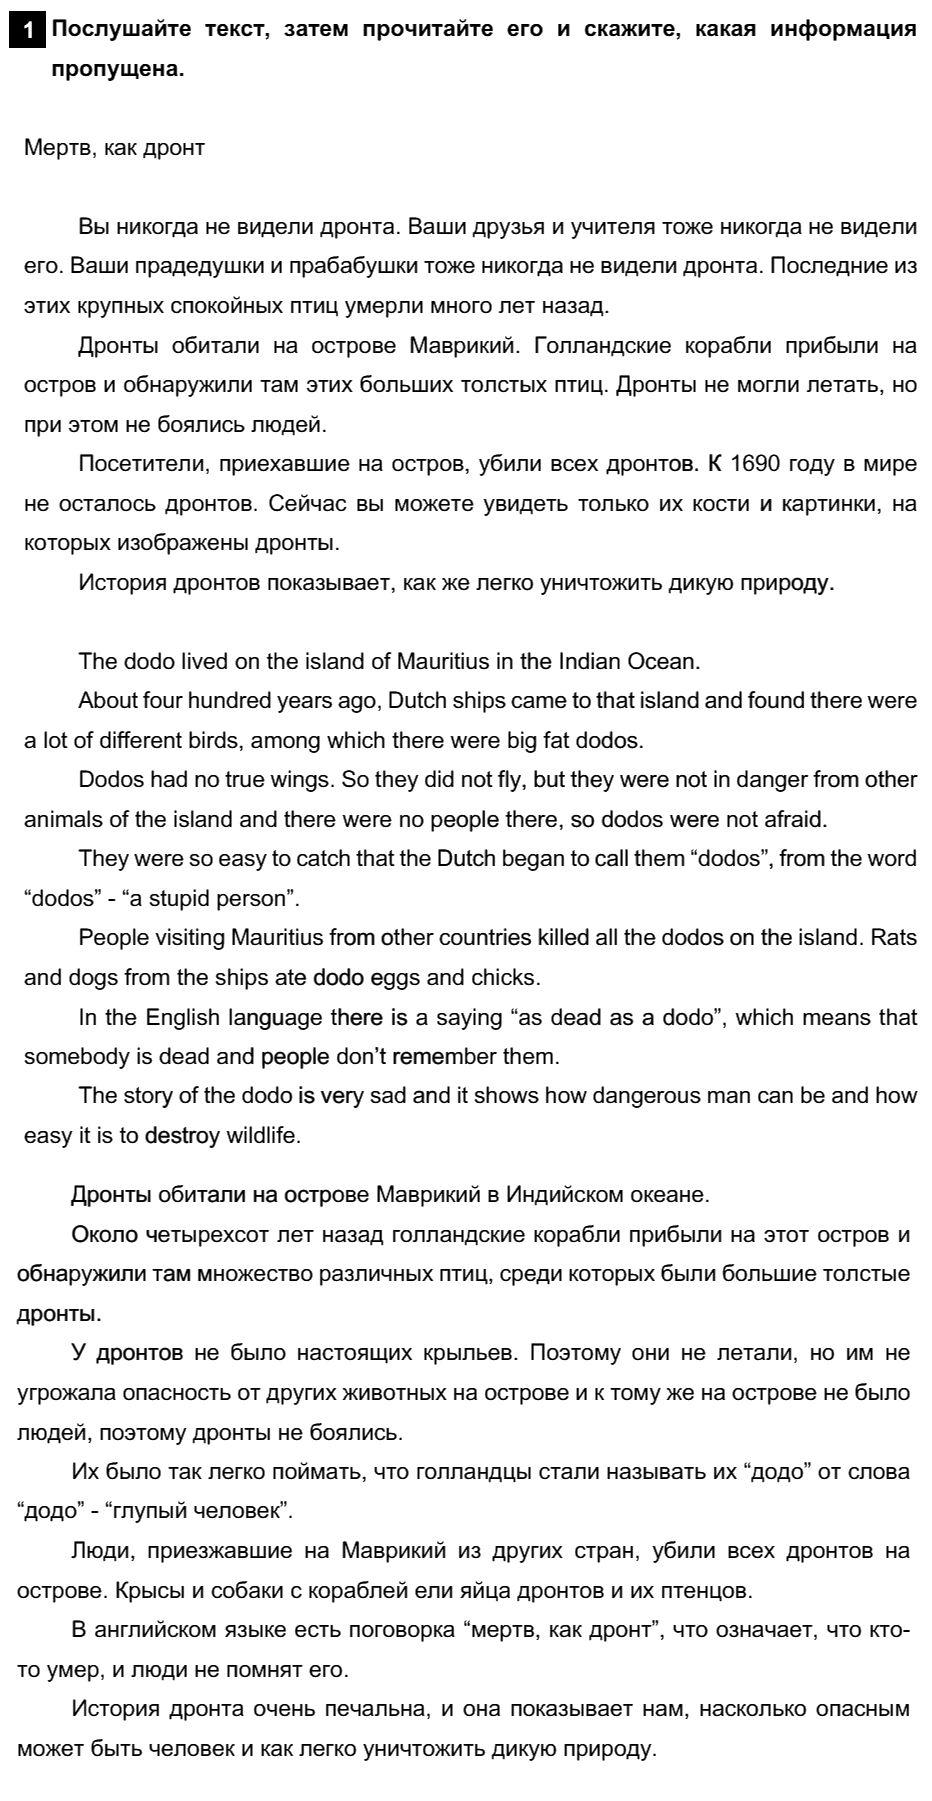 Английский язык 7 класс Афанасьева О. В. Unit 5. Экология / Шаг 7: 1